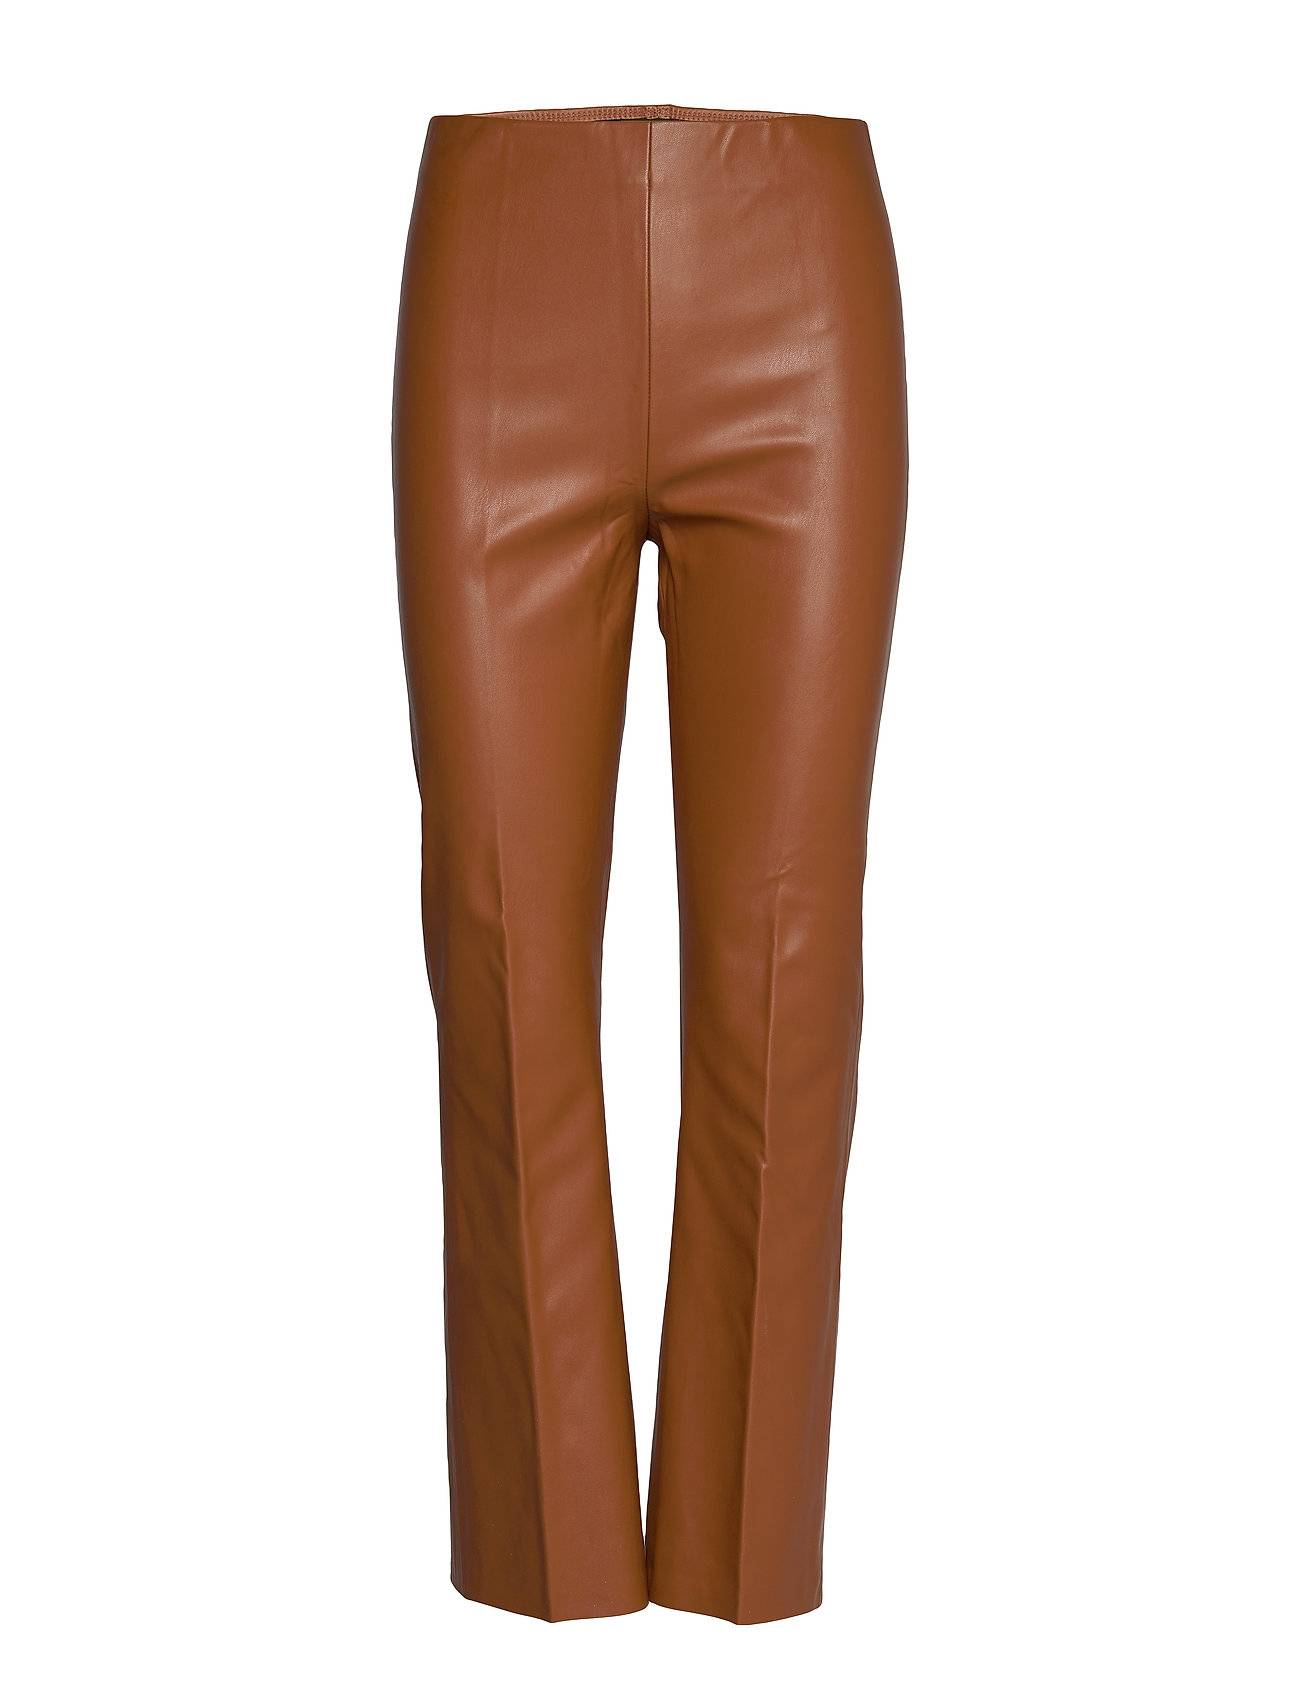 Soaked in Luxury Slkaylee Pu Kickflare Pants Leather Leggings/Housut Ruskea Soaked In Luxury